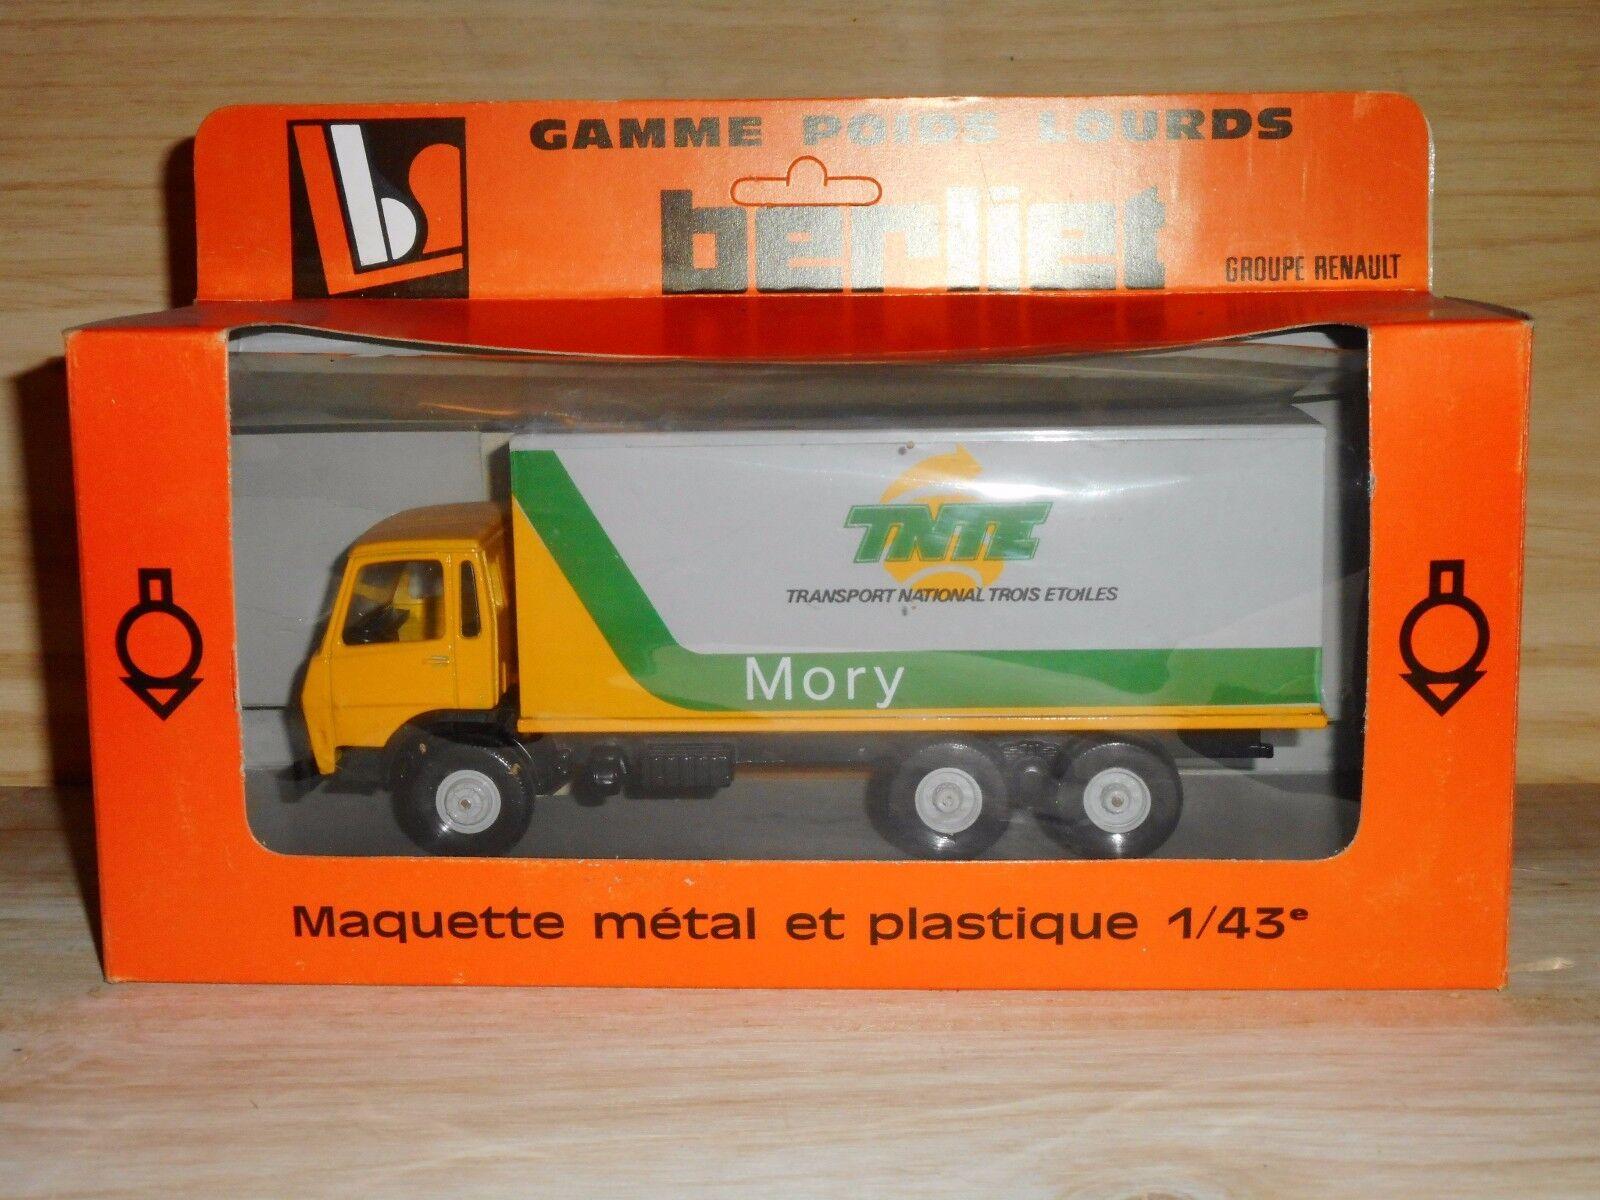 LBS eligor BERLIET  GRH 230  6X4   PUBLICITAIRE   MORY TNTE   transport